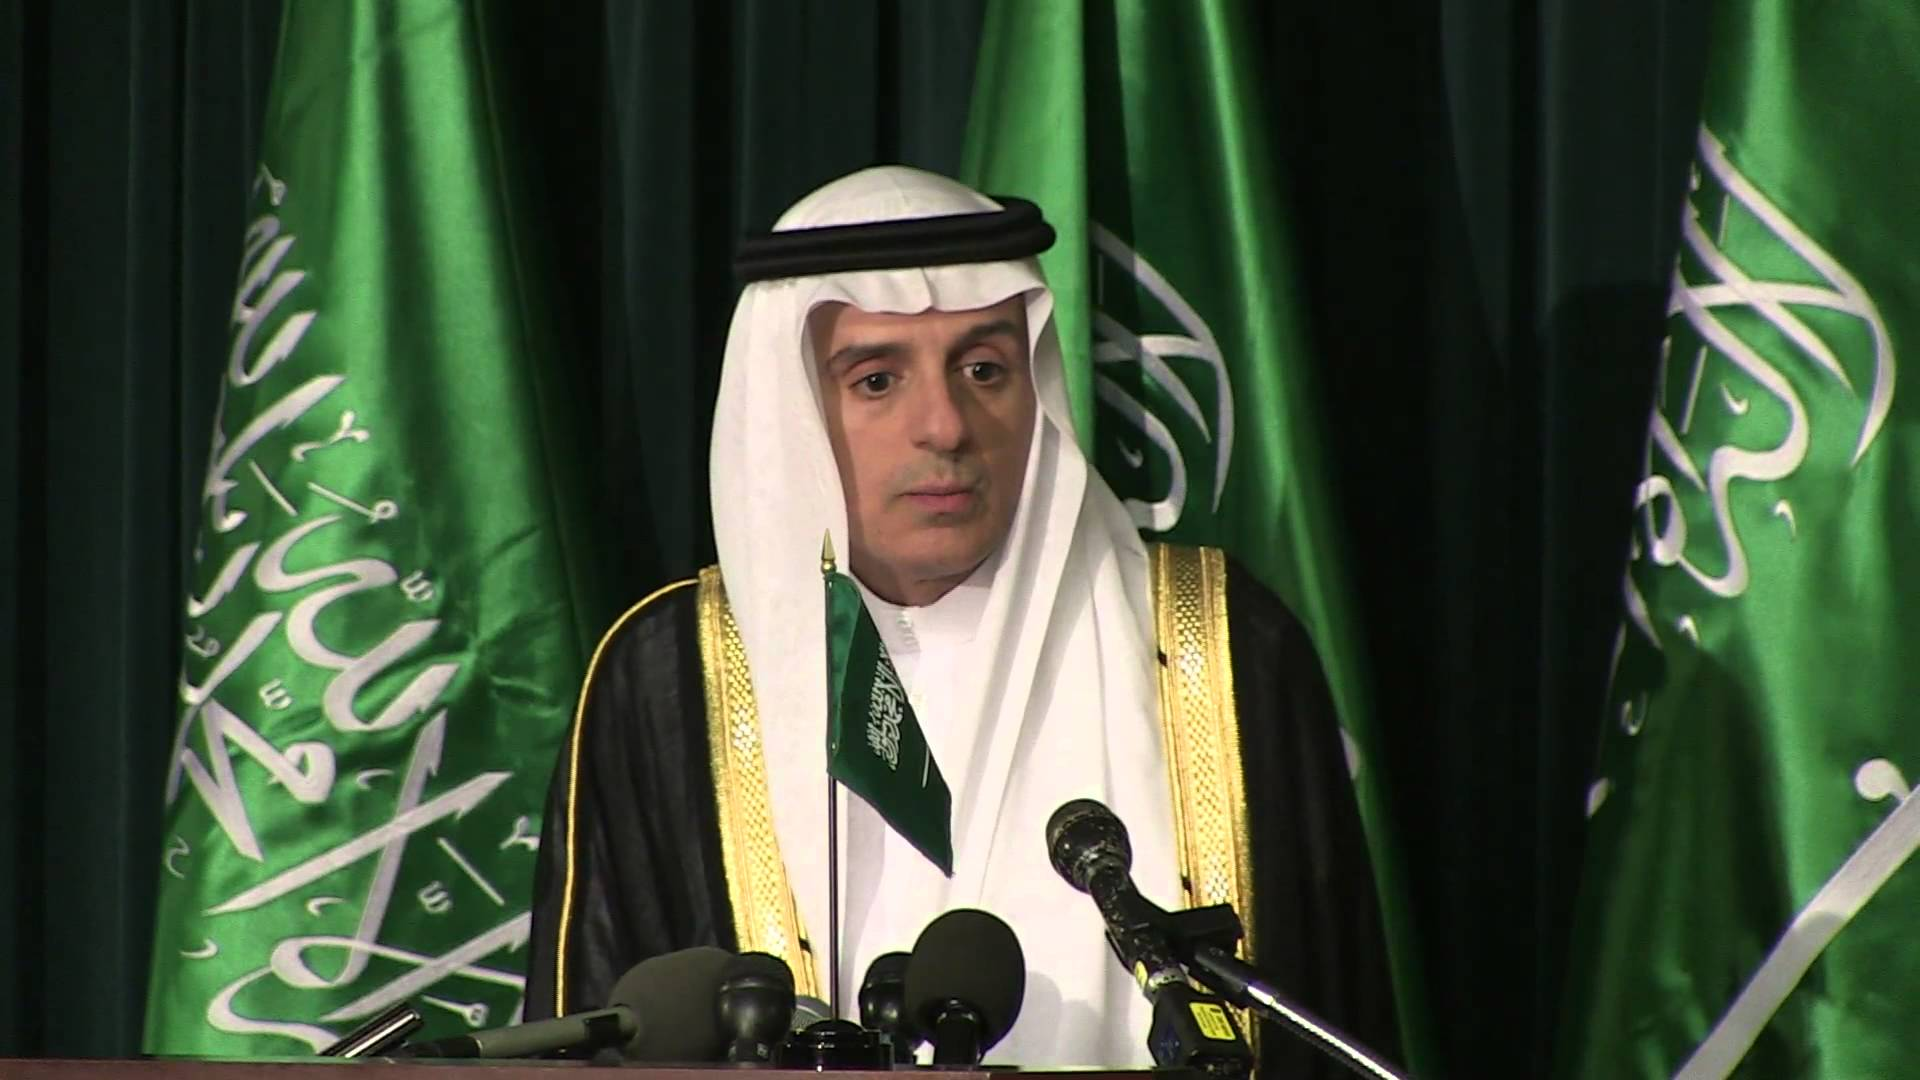 Photo of Iran: Saudi Cutting Ties Won't Distract from Mistake of Sheiklh Nimr Execution